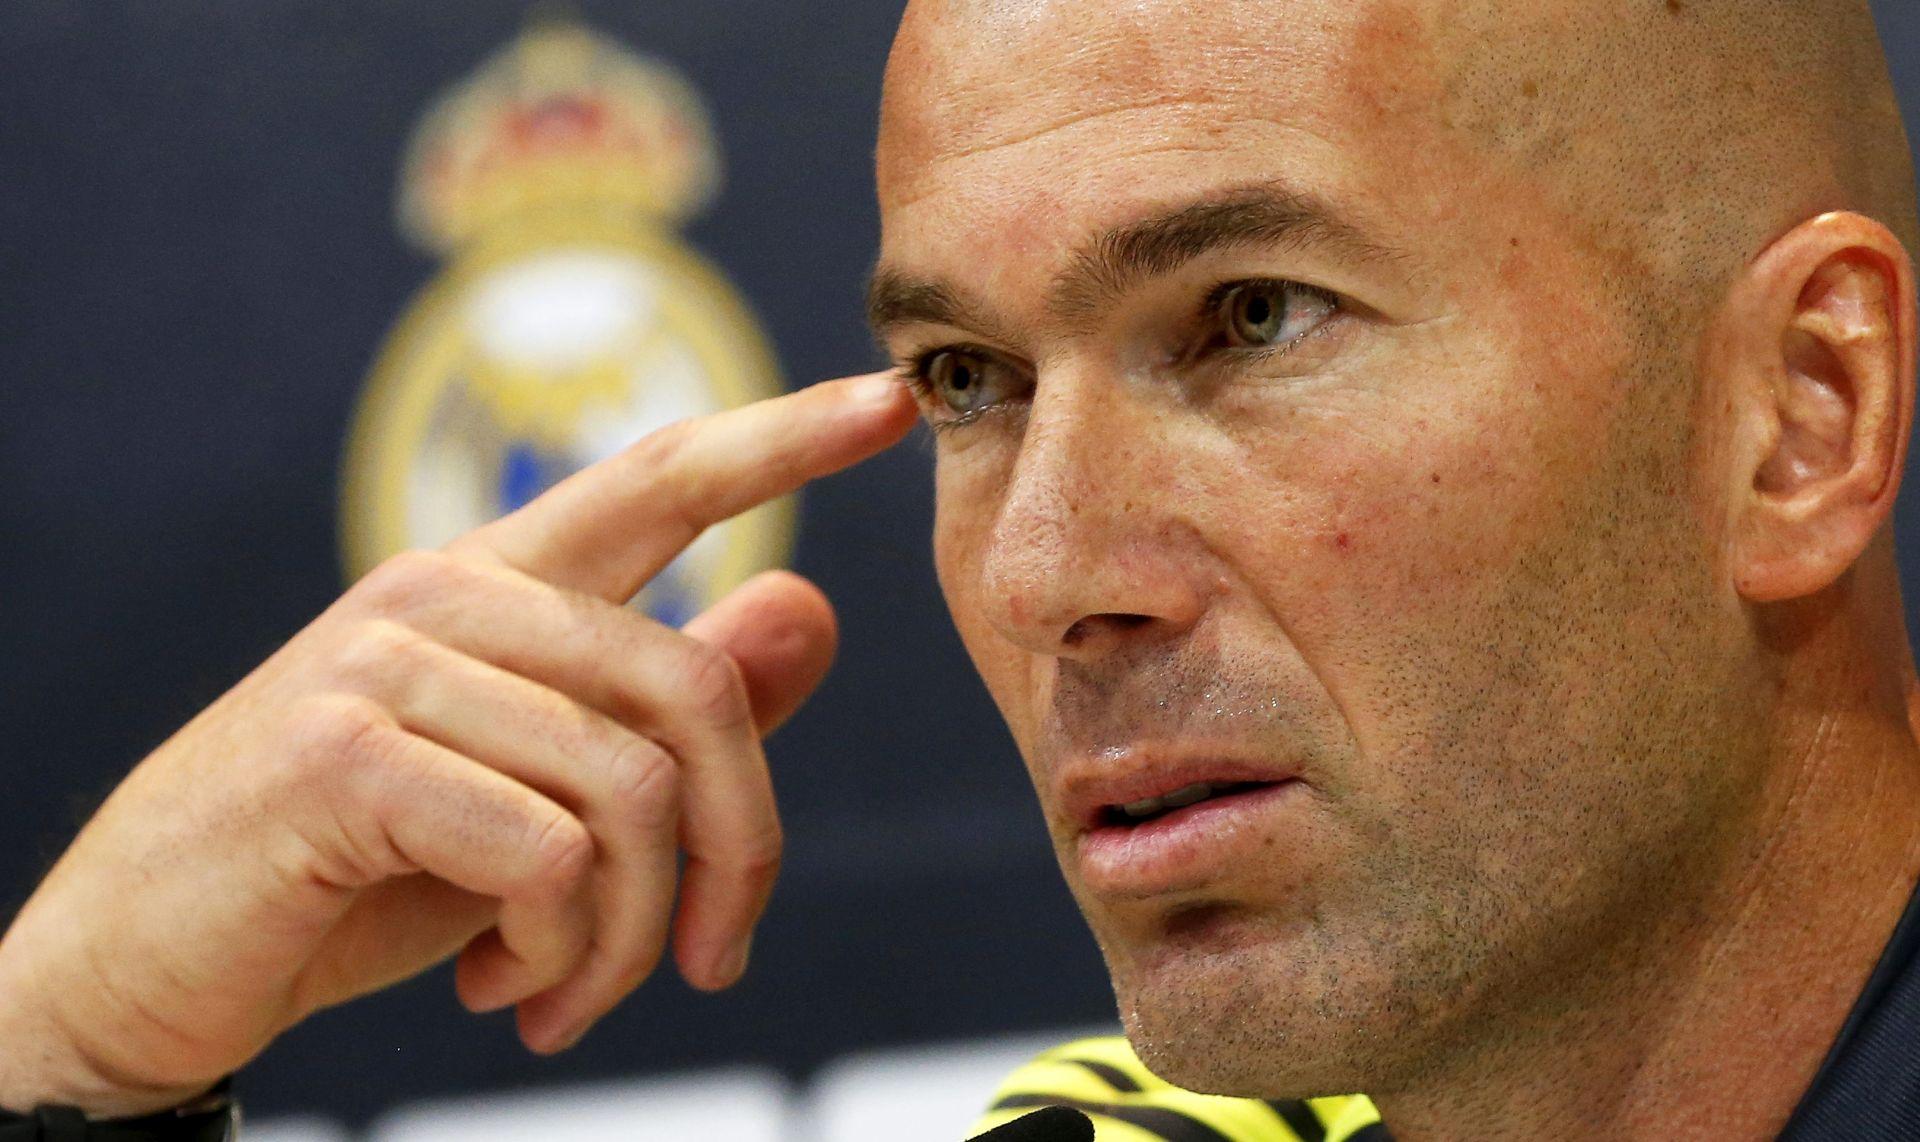 "ZIDANE UOČI PRVE UTAKMICE NA KLUPI KRALJEVA ""Cristiano je duša kluba, nema govora o transferu"""